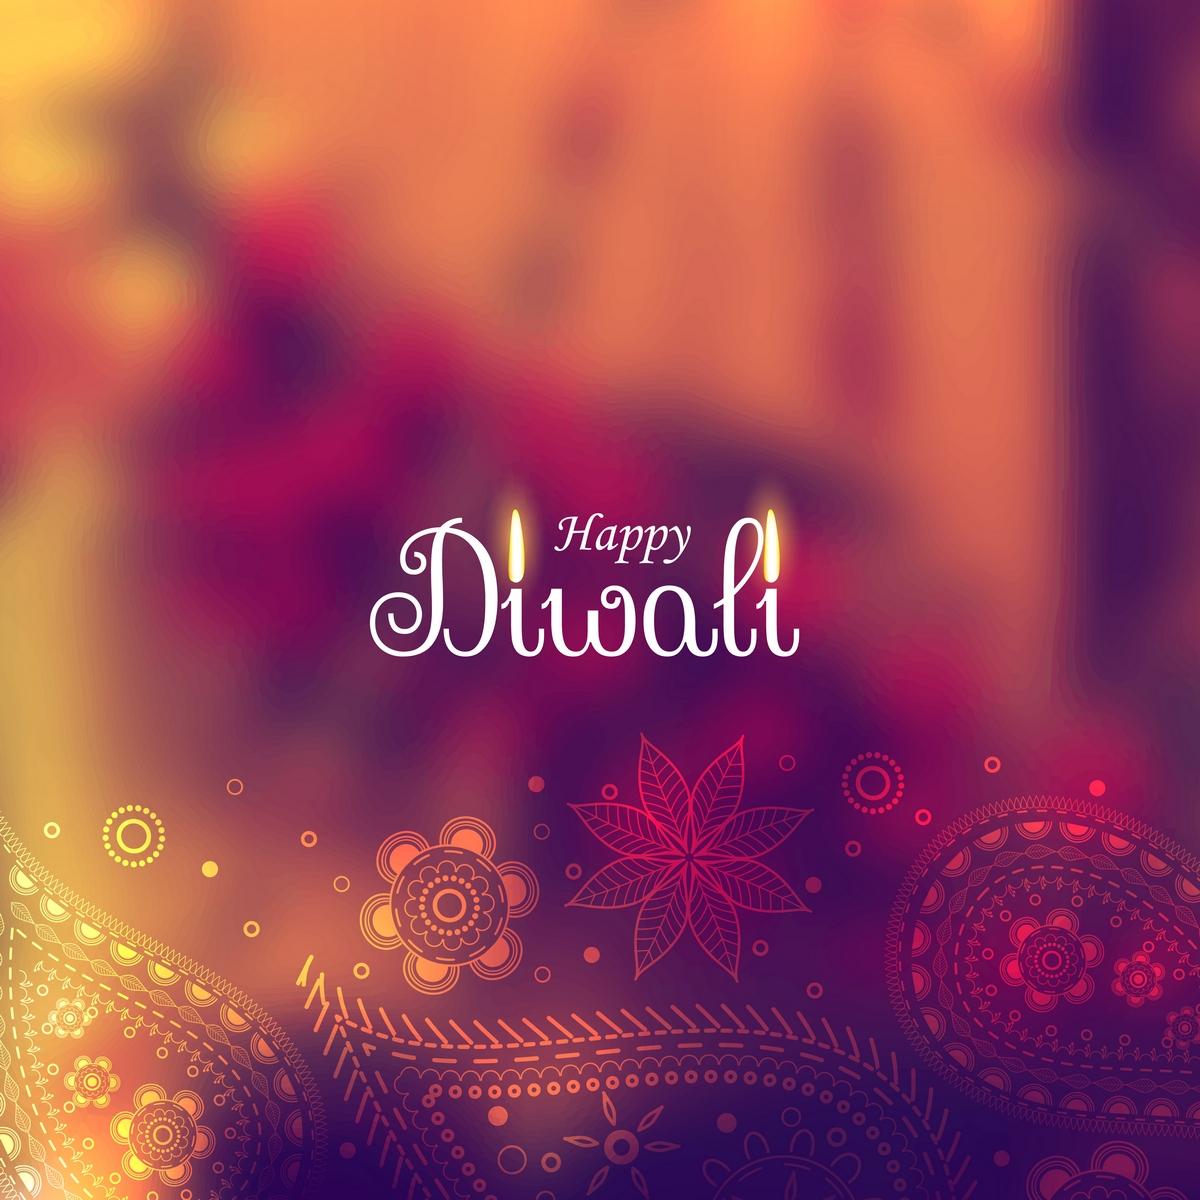 47 beautiful diwali greeting cards and happy diwali wishes beautiful diwali greeting cards for greetings kristyandbryce Choice Image